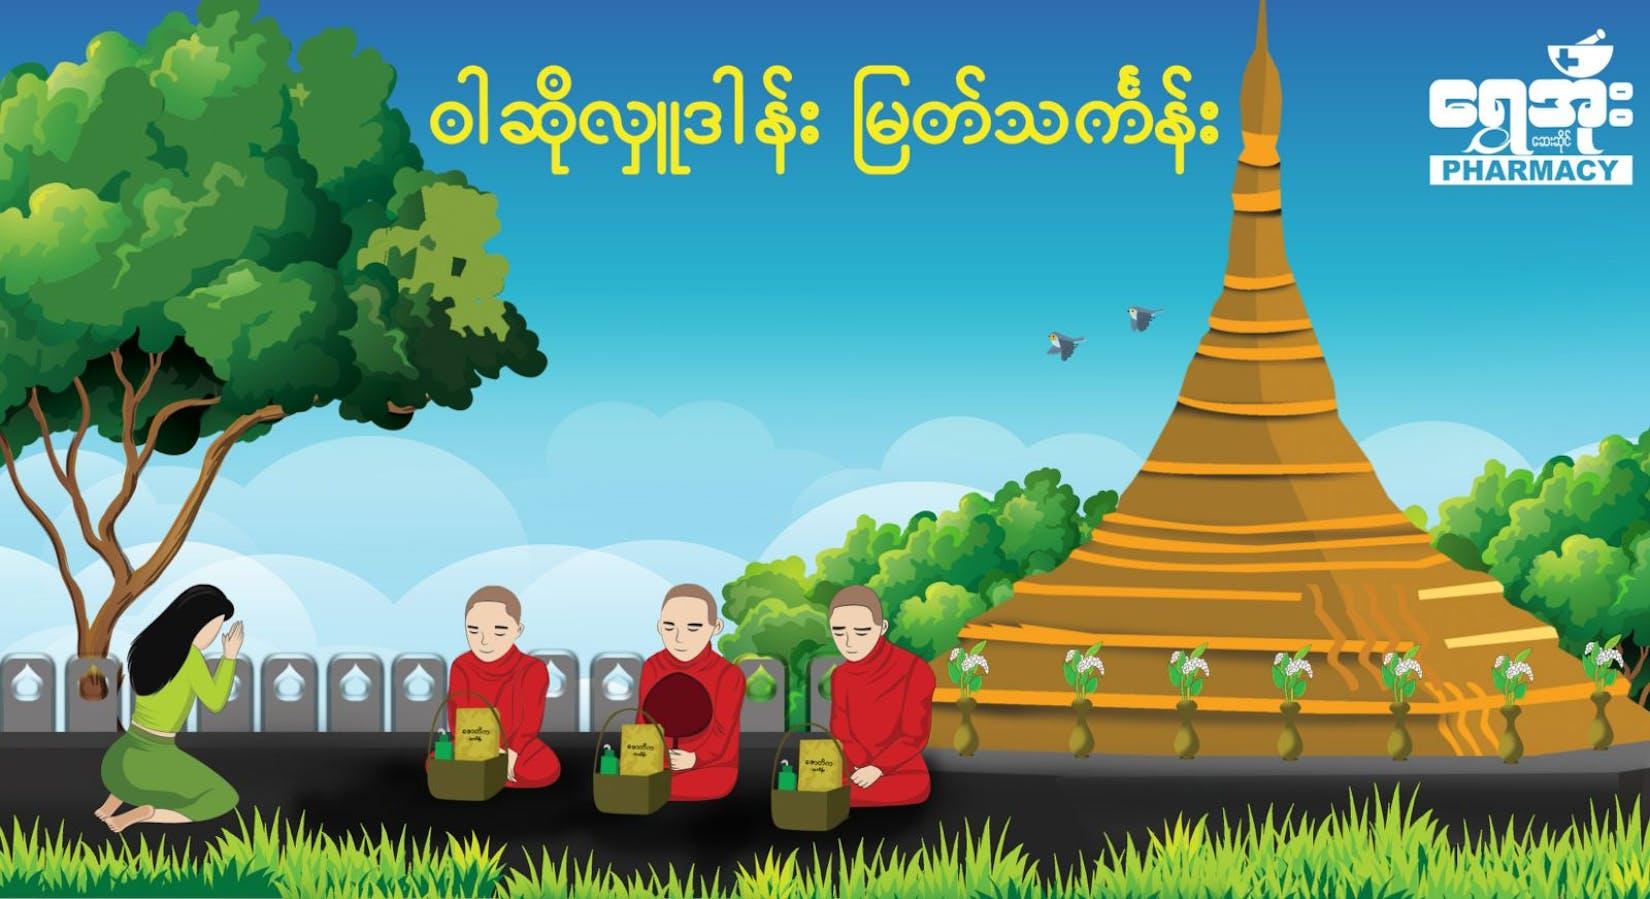 Shwe Ohh Phamacy ရွှေအိုး Shan Gone Branch | Beauty